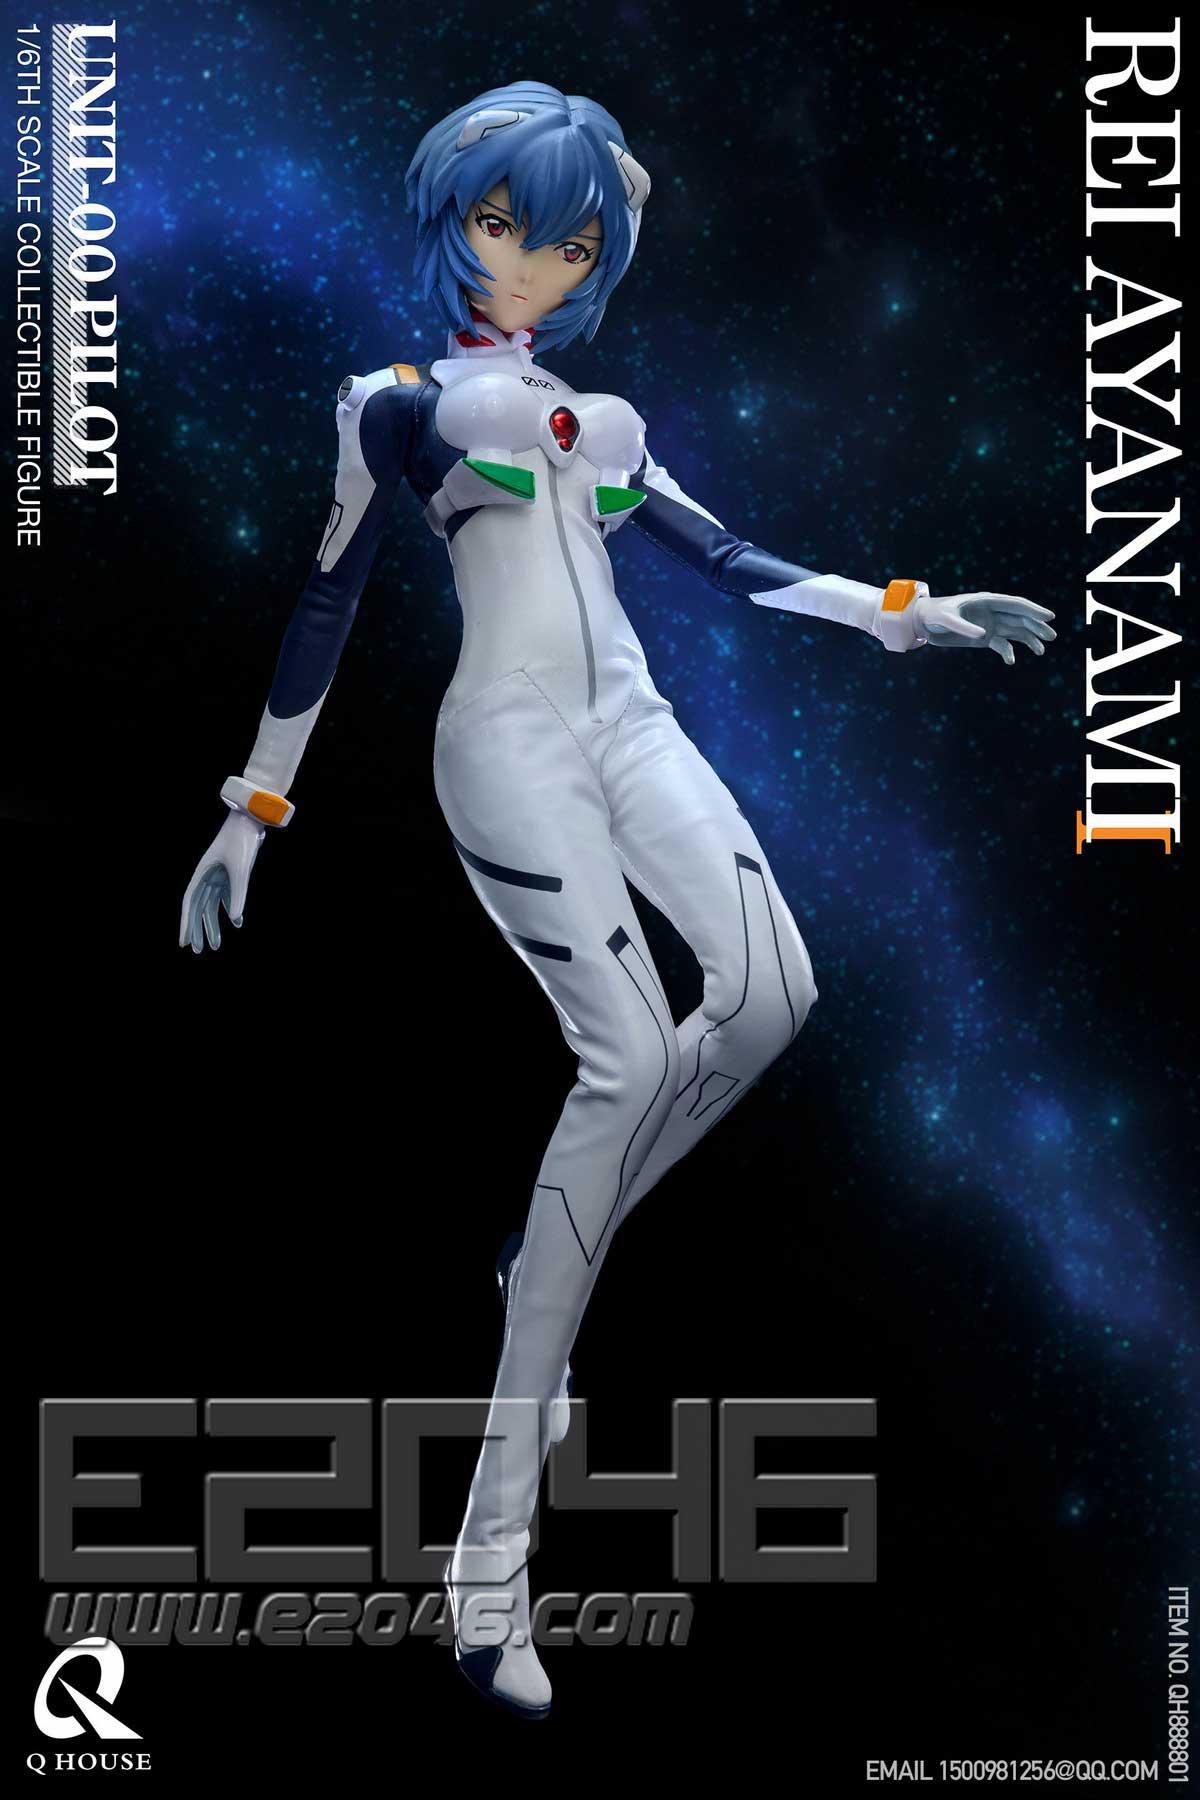 Ayanami (DOLL)